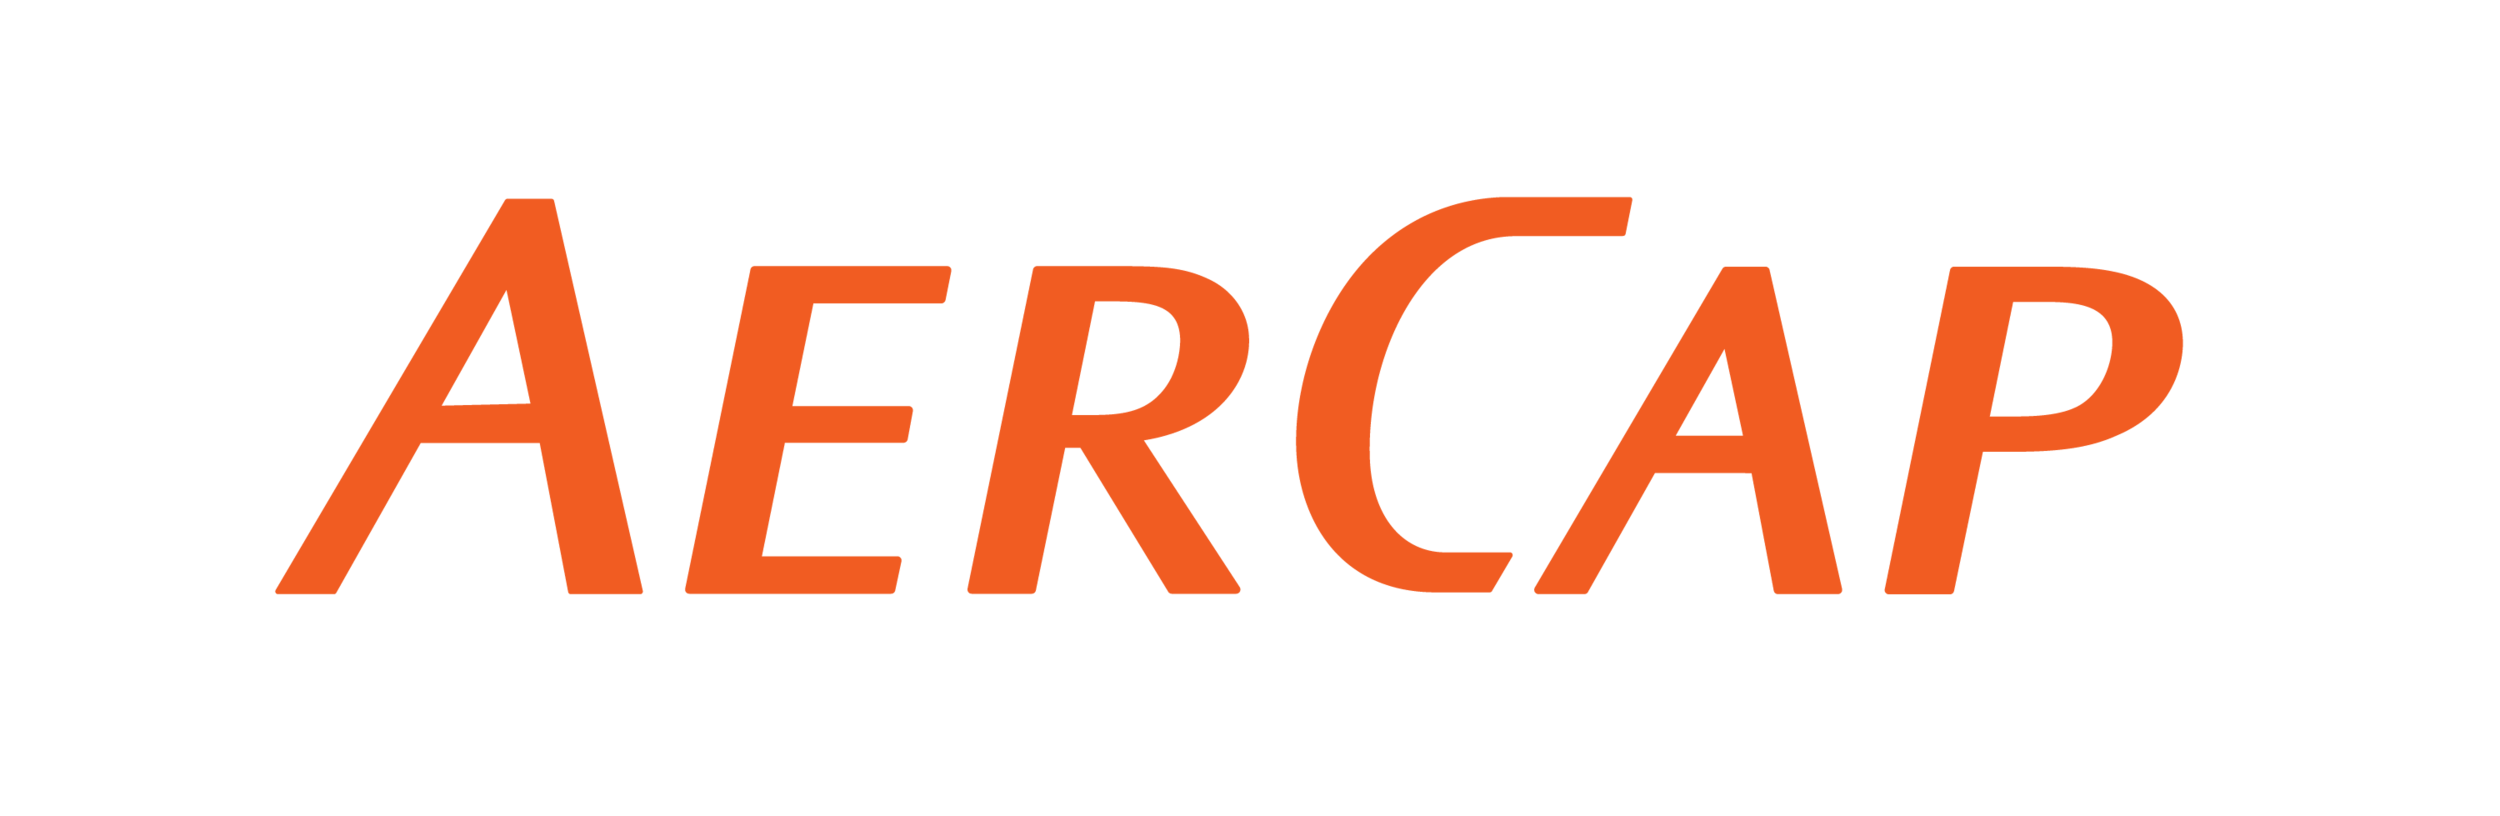 aercap-logo-transparent-background.png